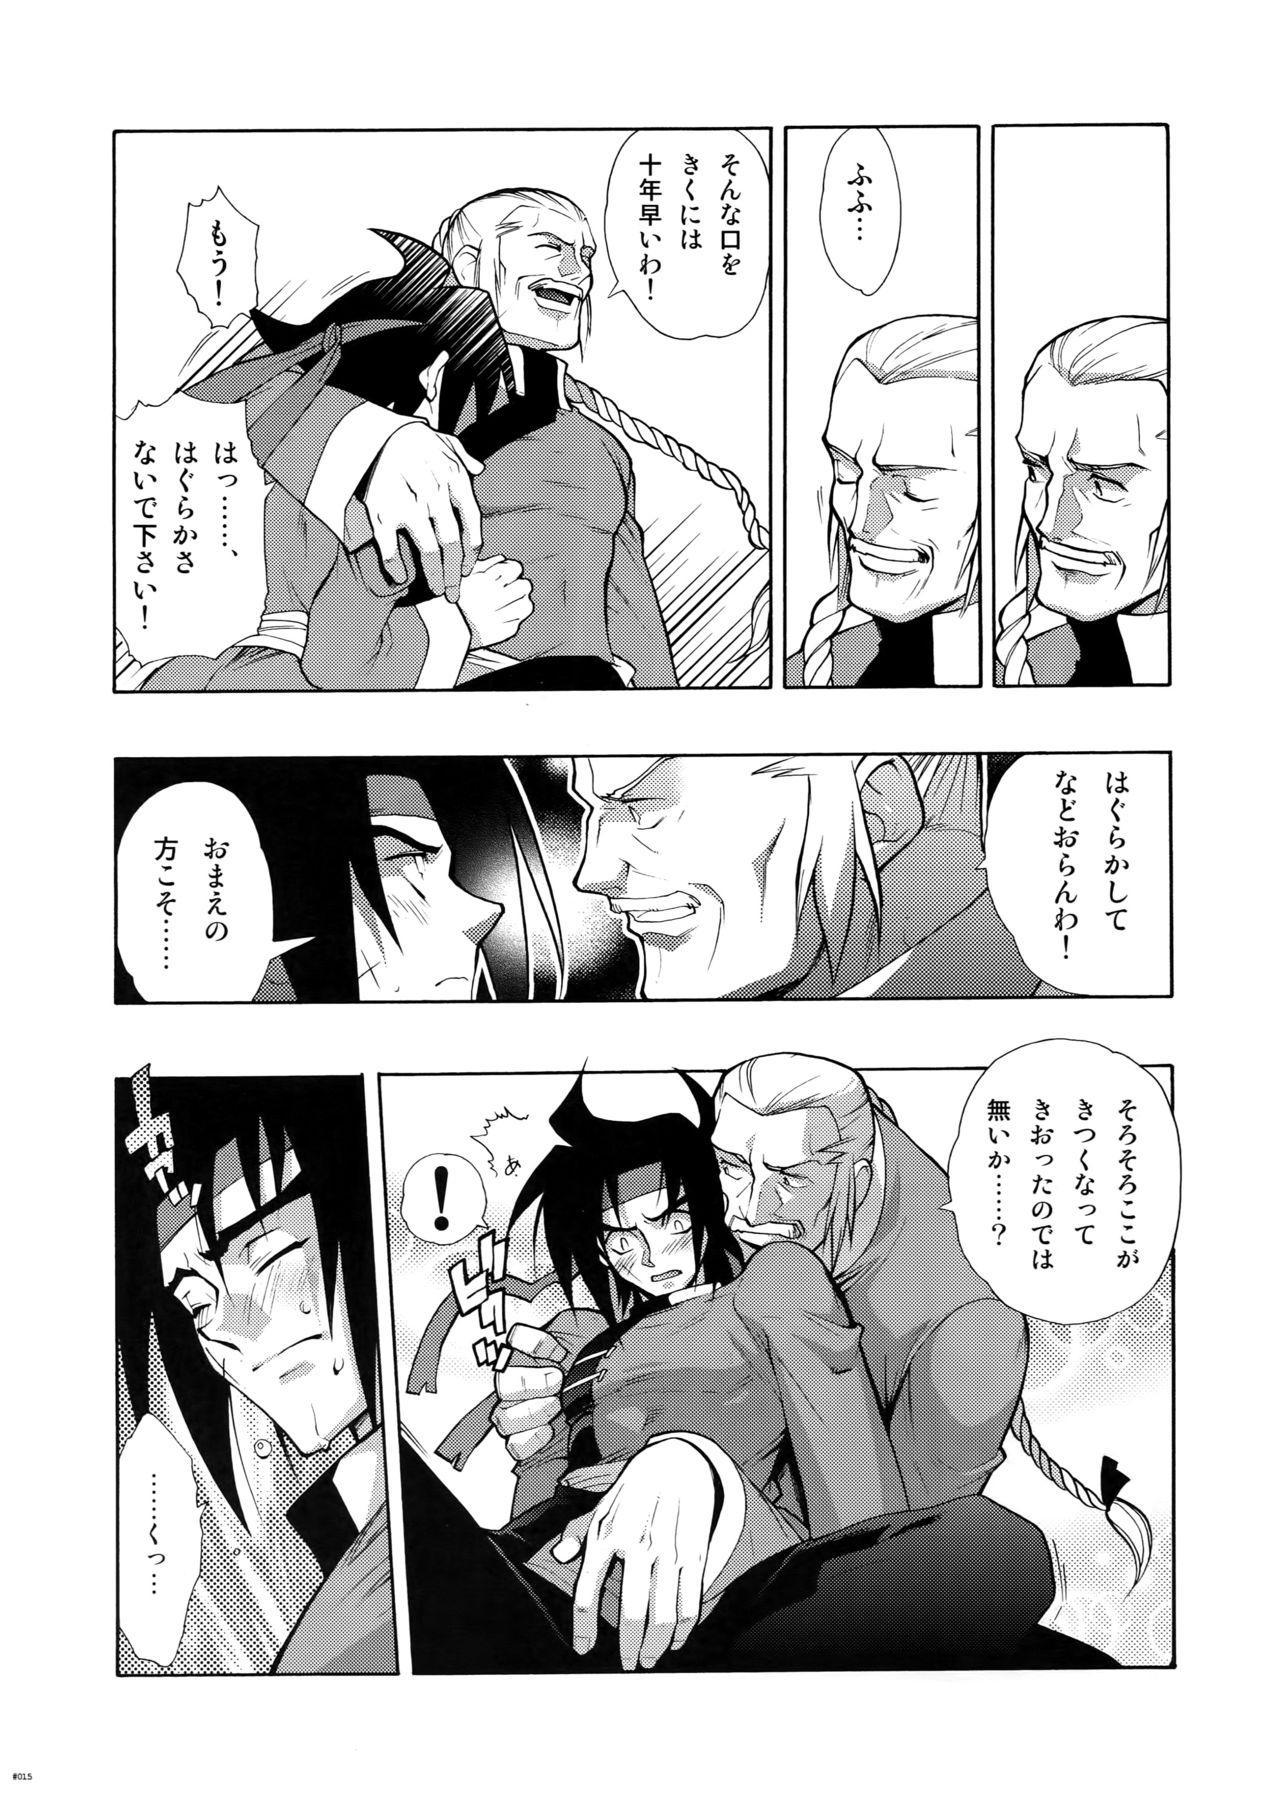 [Article 60 of Criminal Code (Shuhan)] G-gan Josei-Muke Sairoku-Shuu (G Gundam) 14